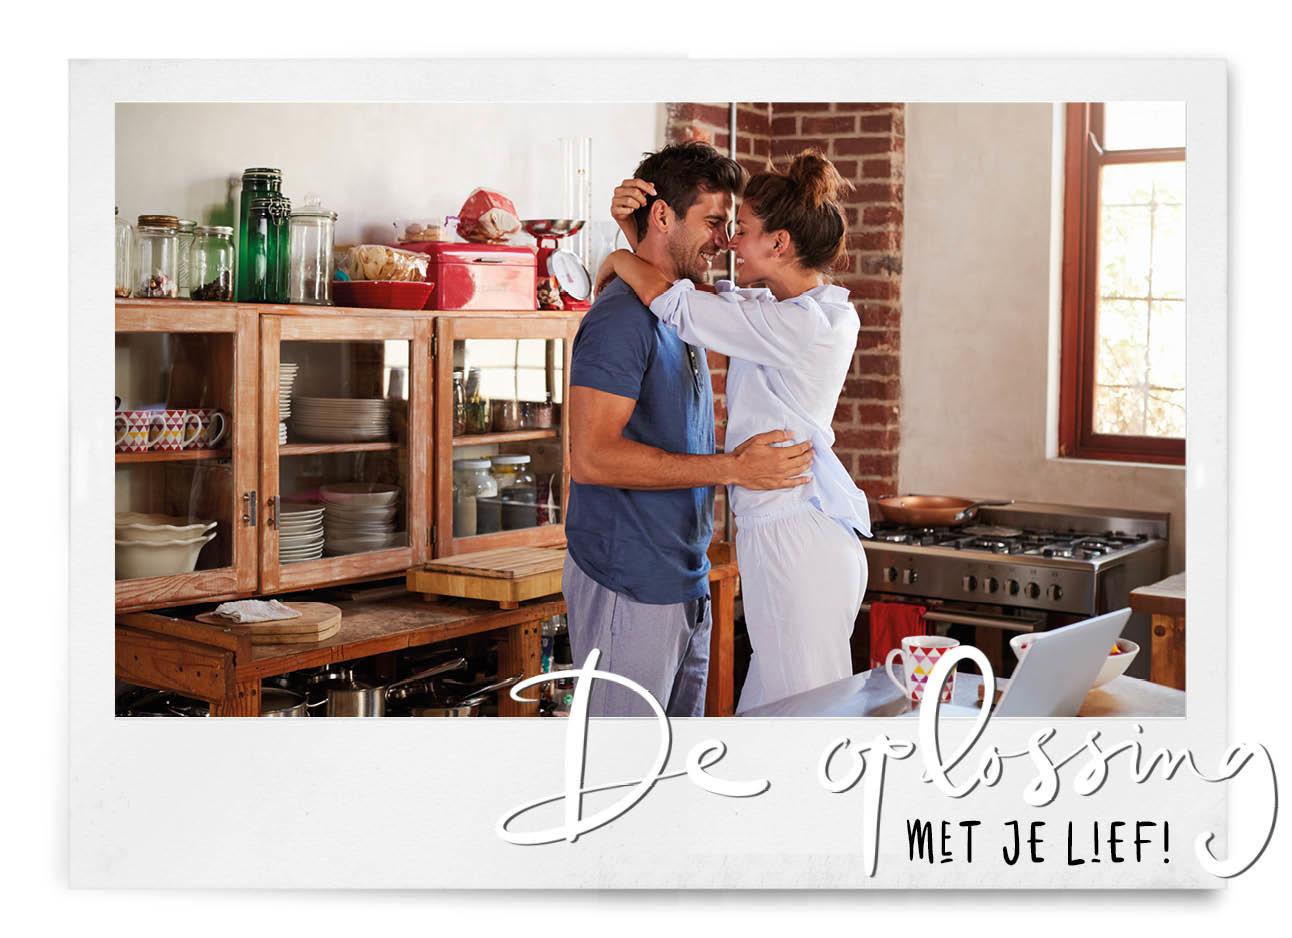 vrouw en man in de keuken in pyjama kussen lachend